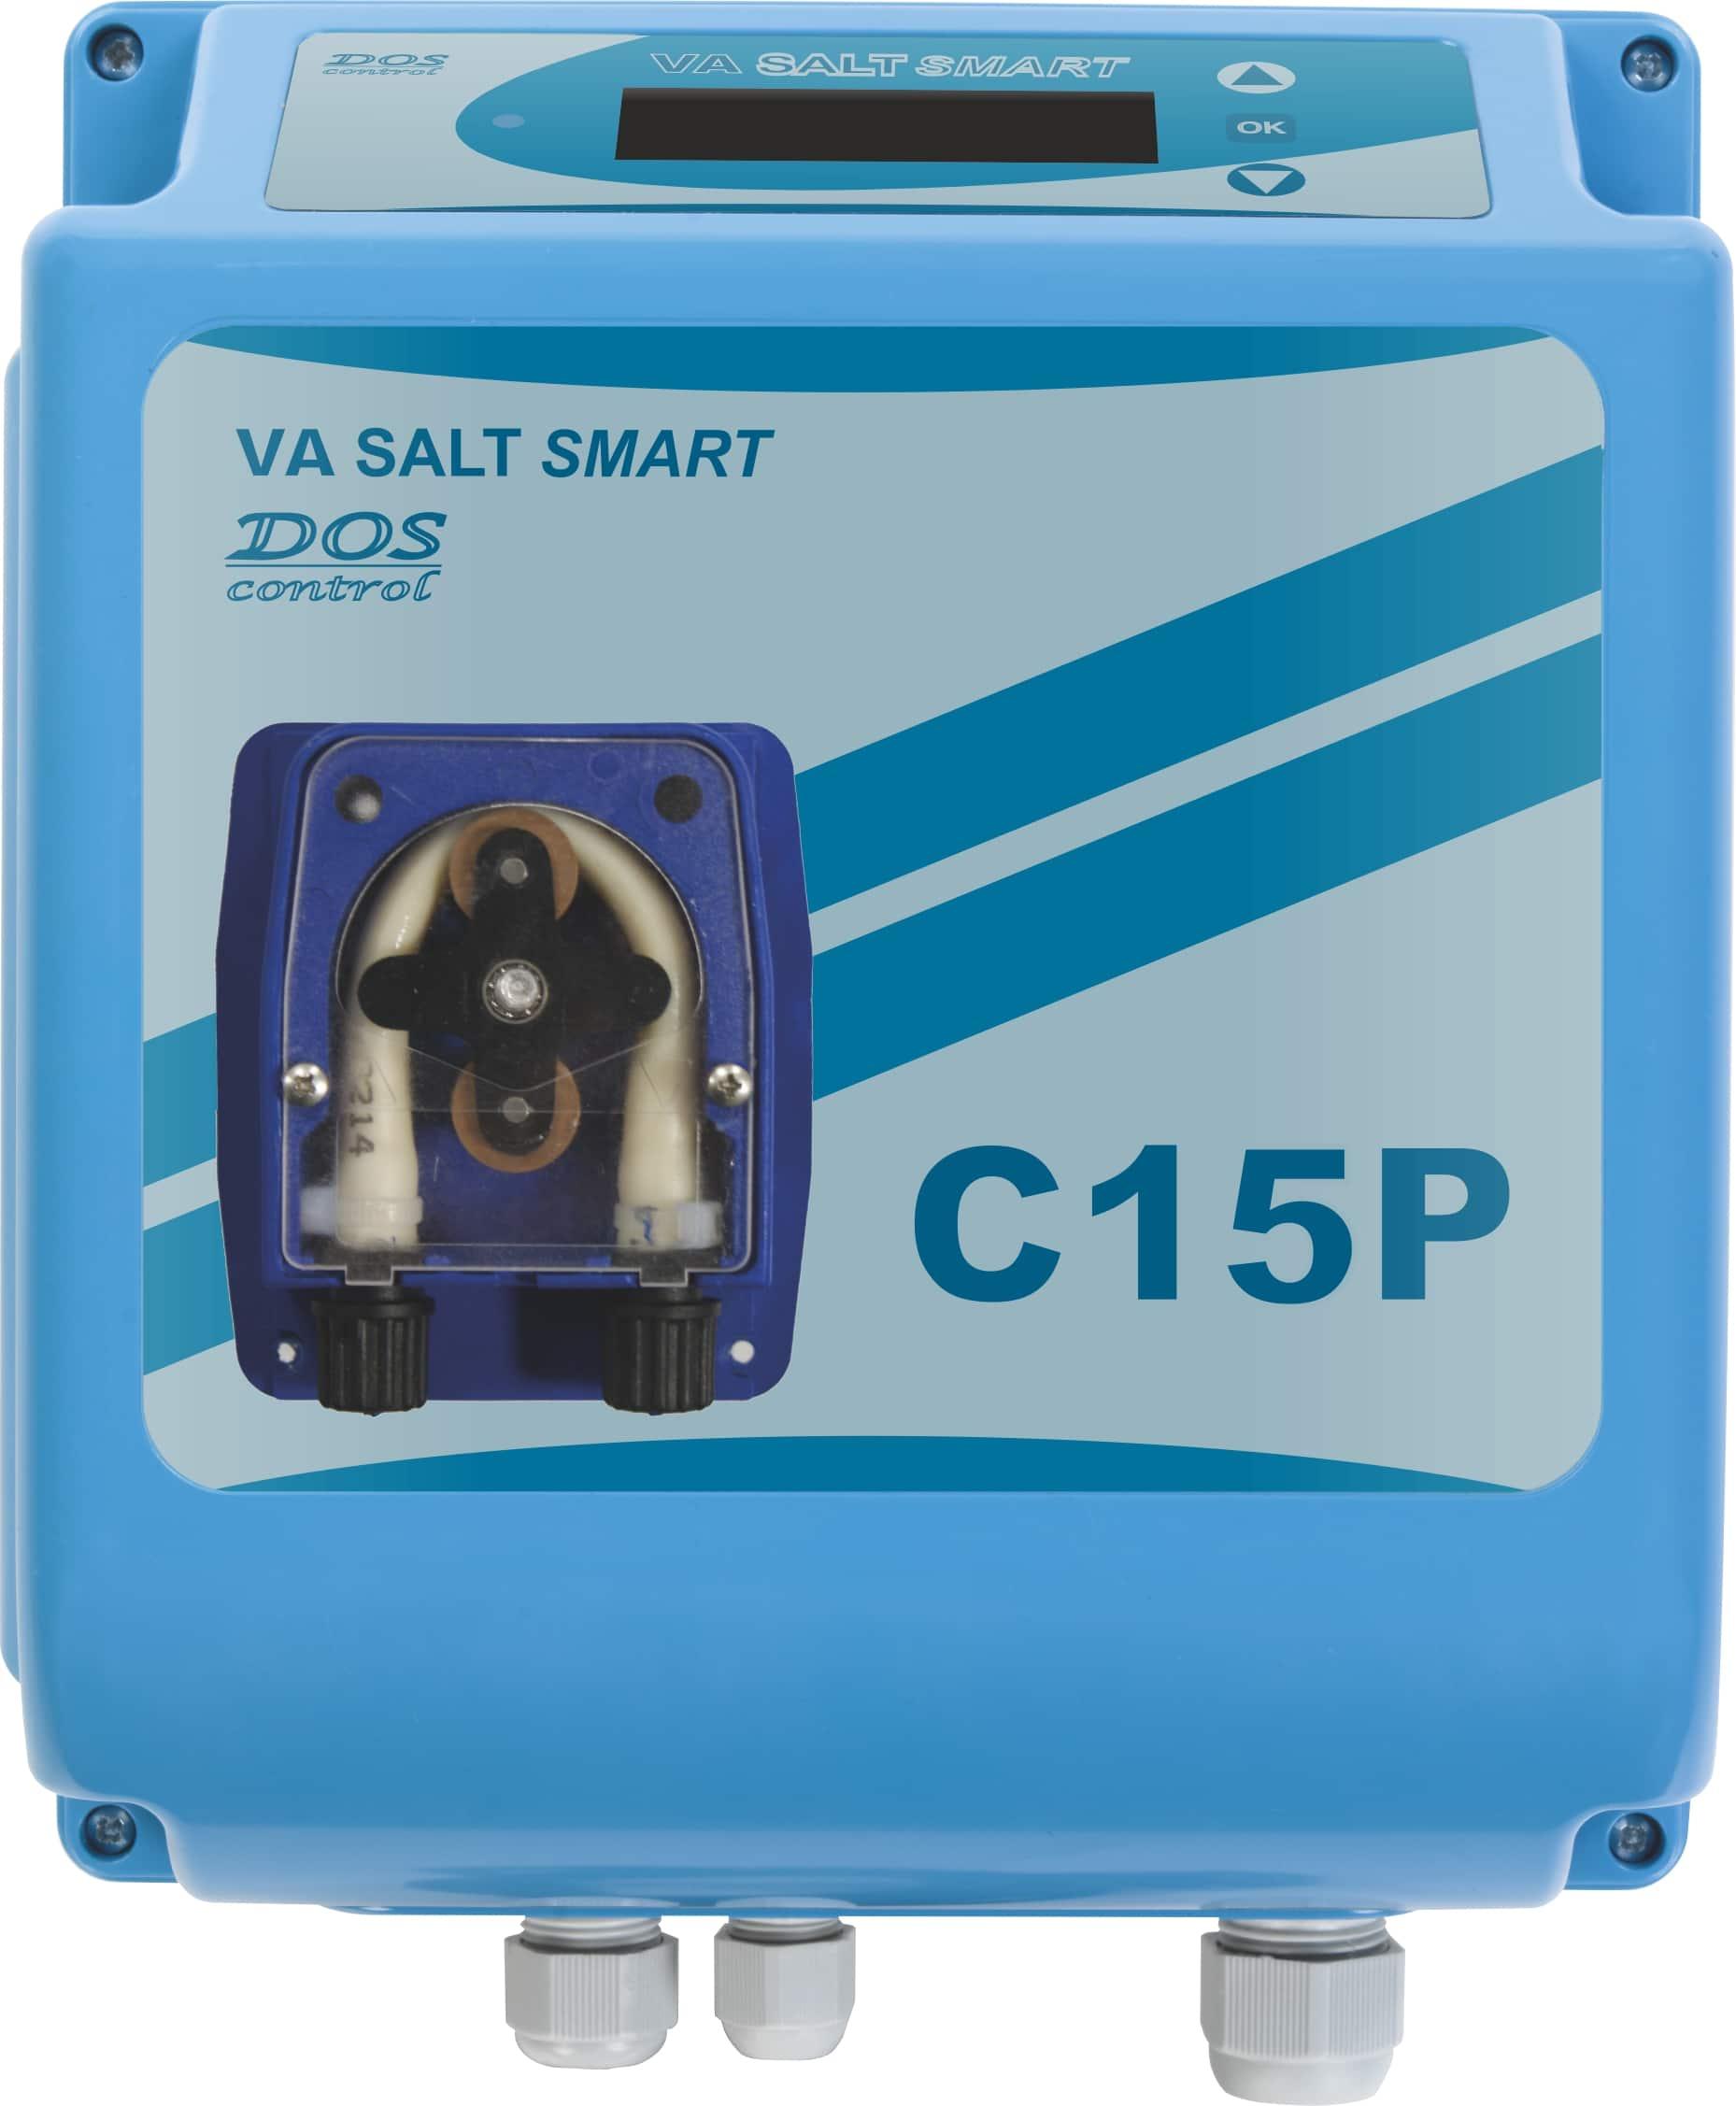 VA-SALT-SMART-C15P